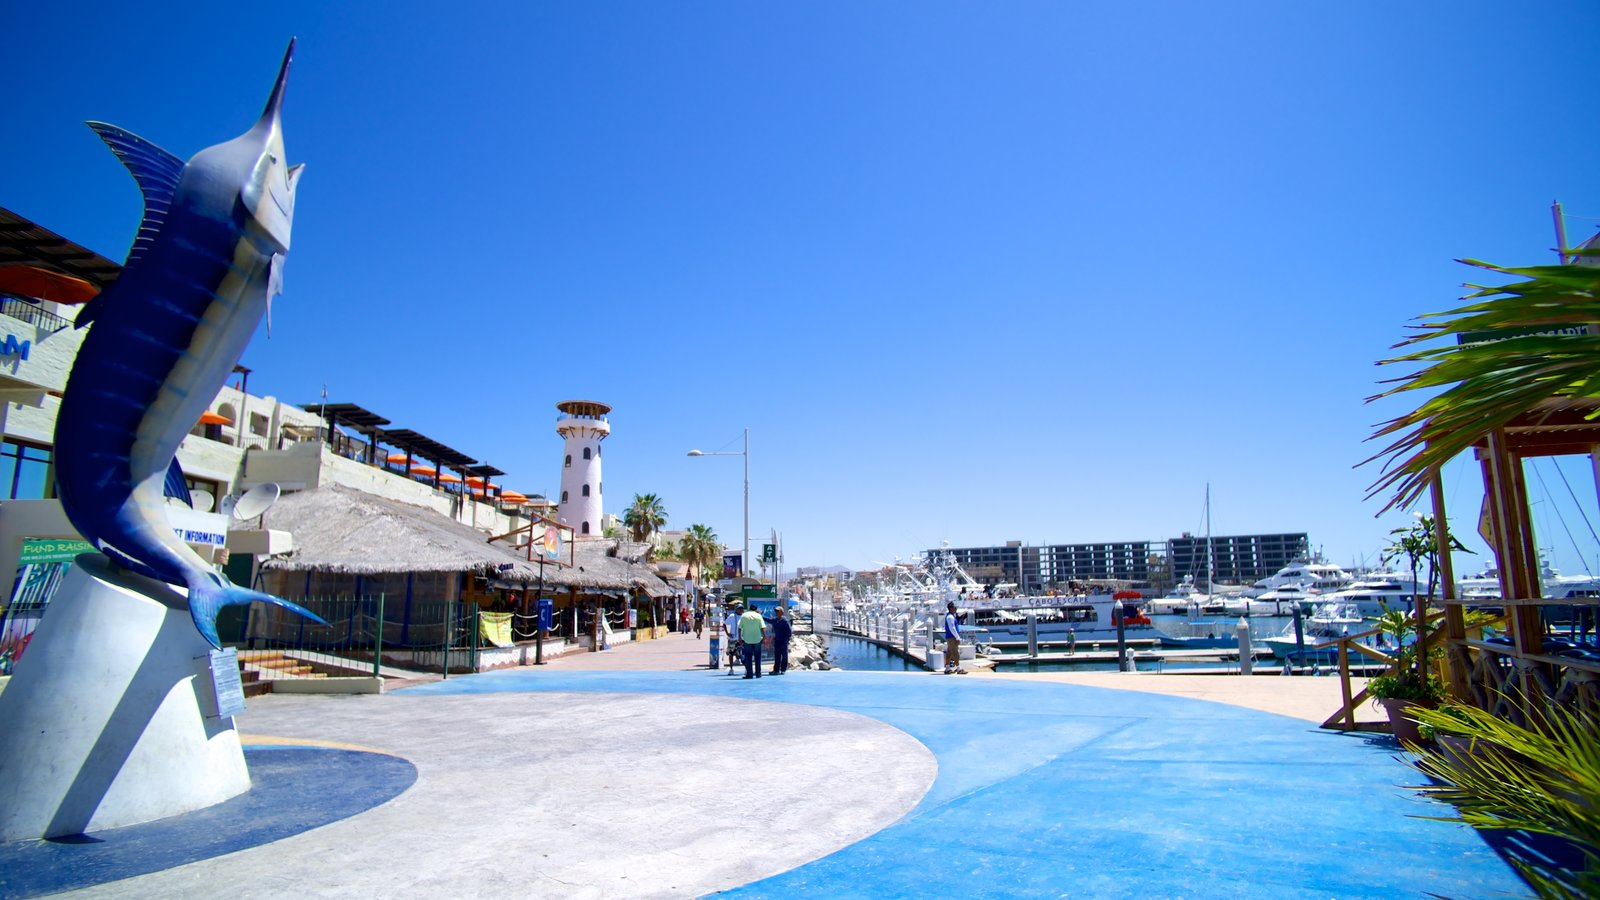 Marina Cabo San Lucas which includes outdoor art, a marina and a coastal town